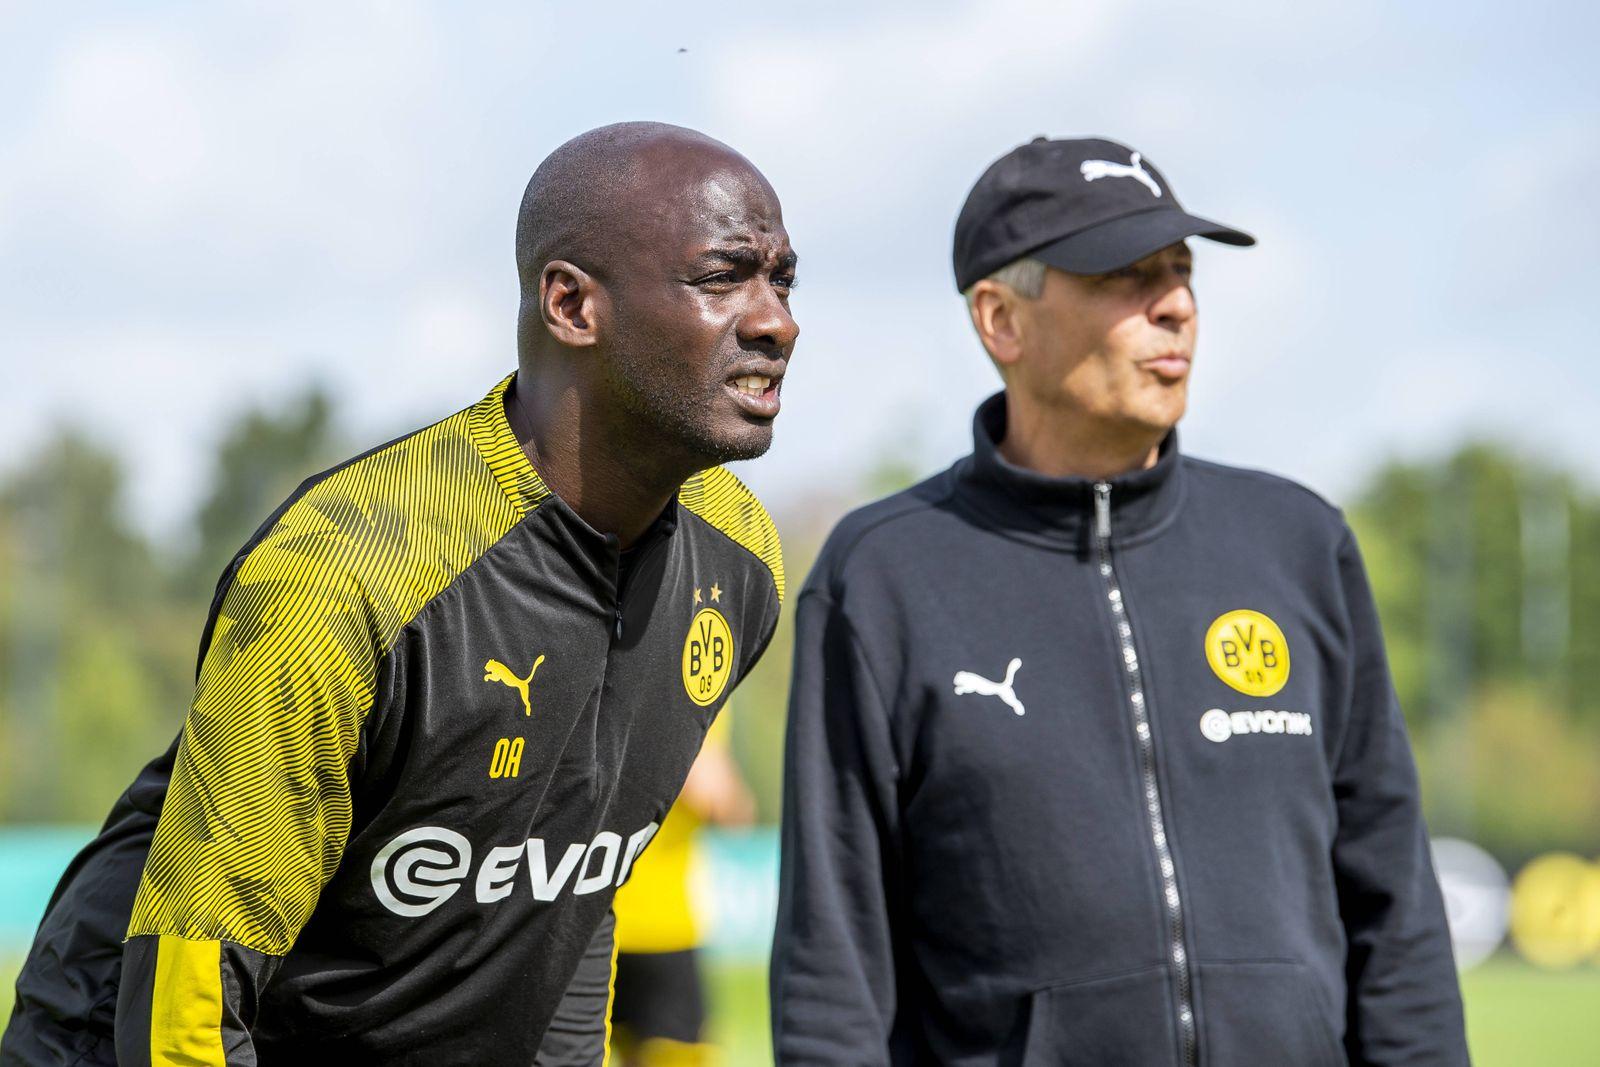 Fu?ball 1 Bundesliga Saison 2019 2020 Training von Borussia Dortmund am 20 08 2019 in Dortmund